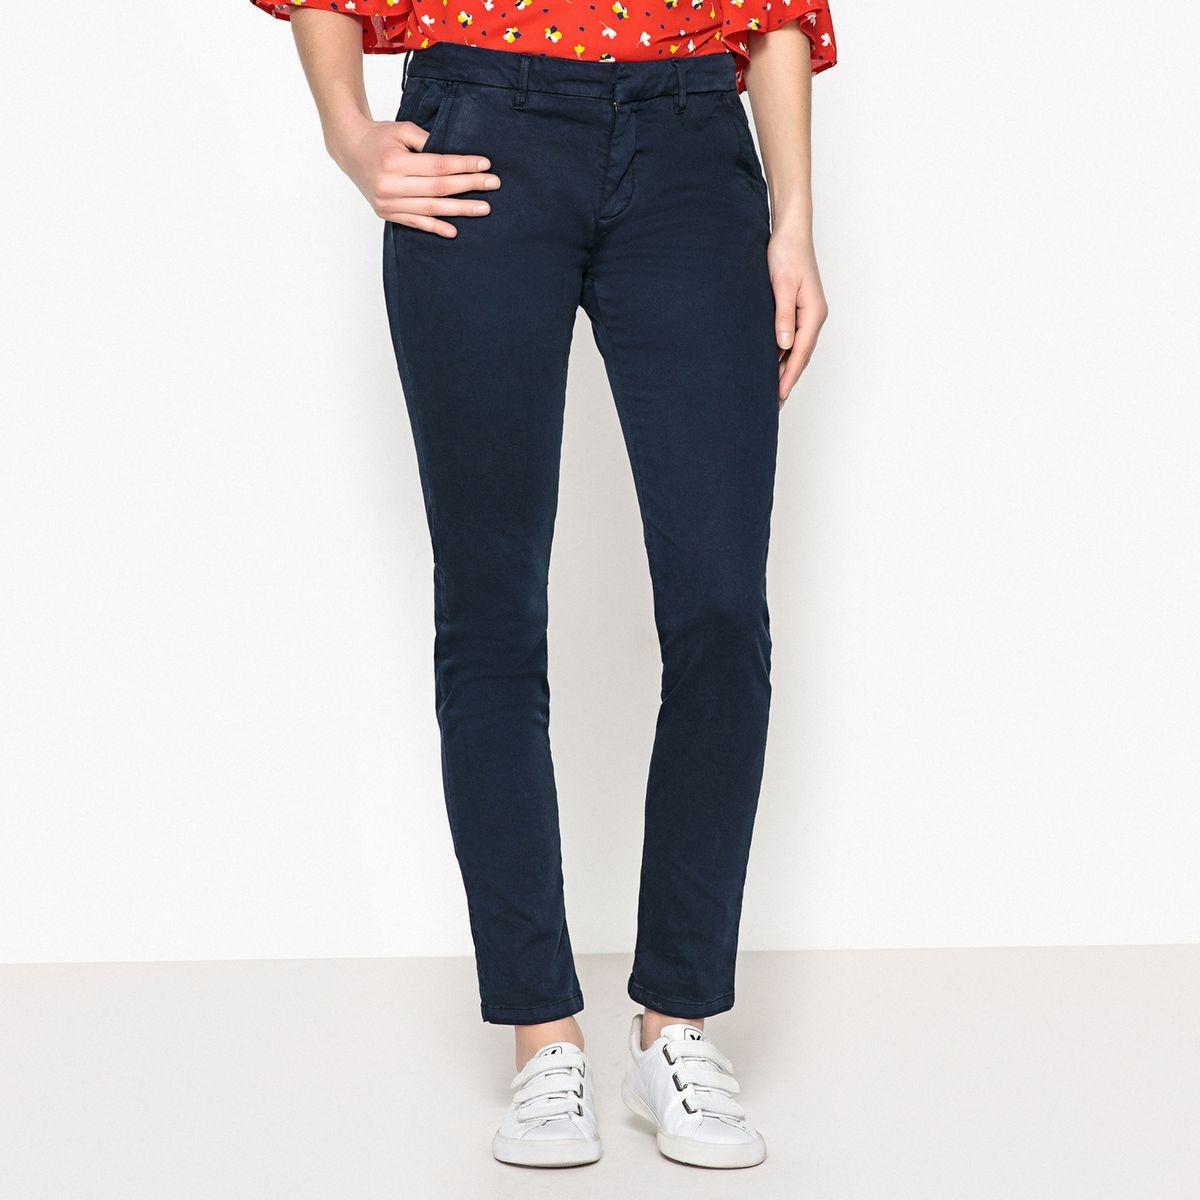 Pantalon chino SANDY 2 BASIC